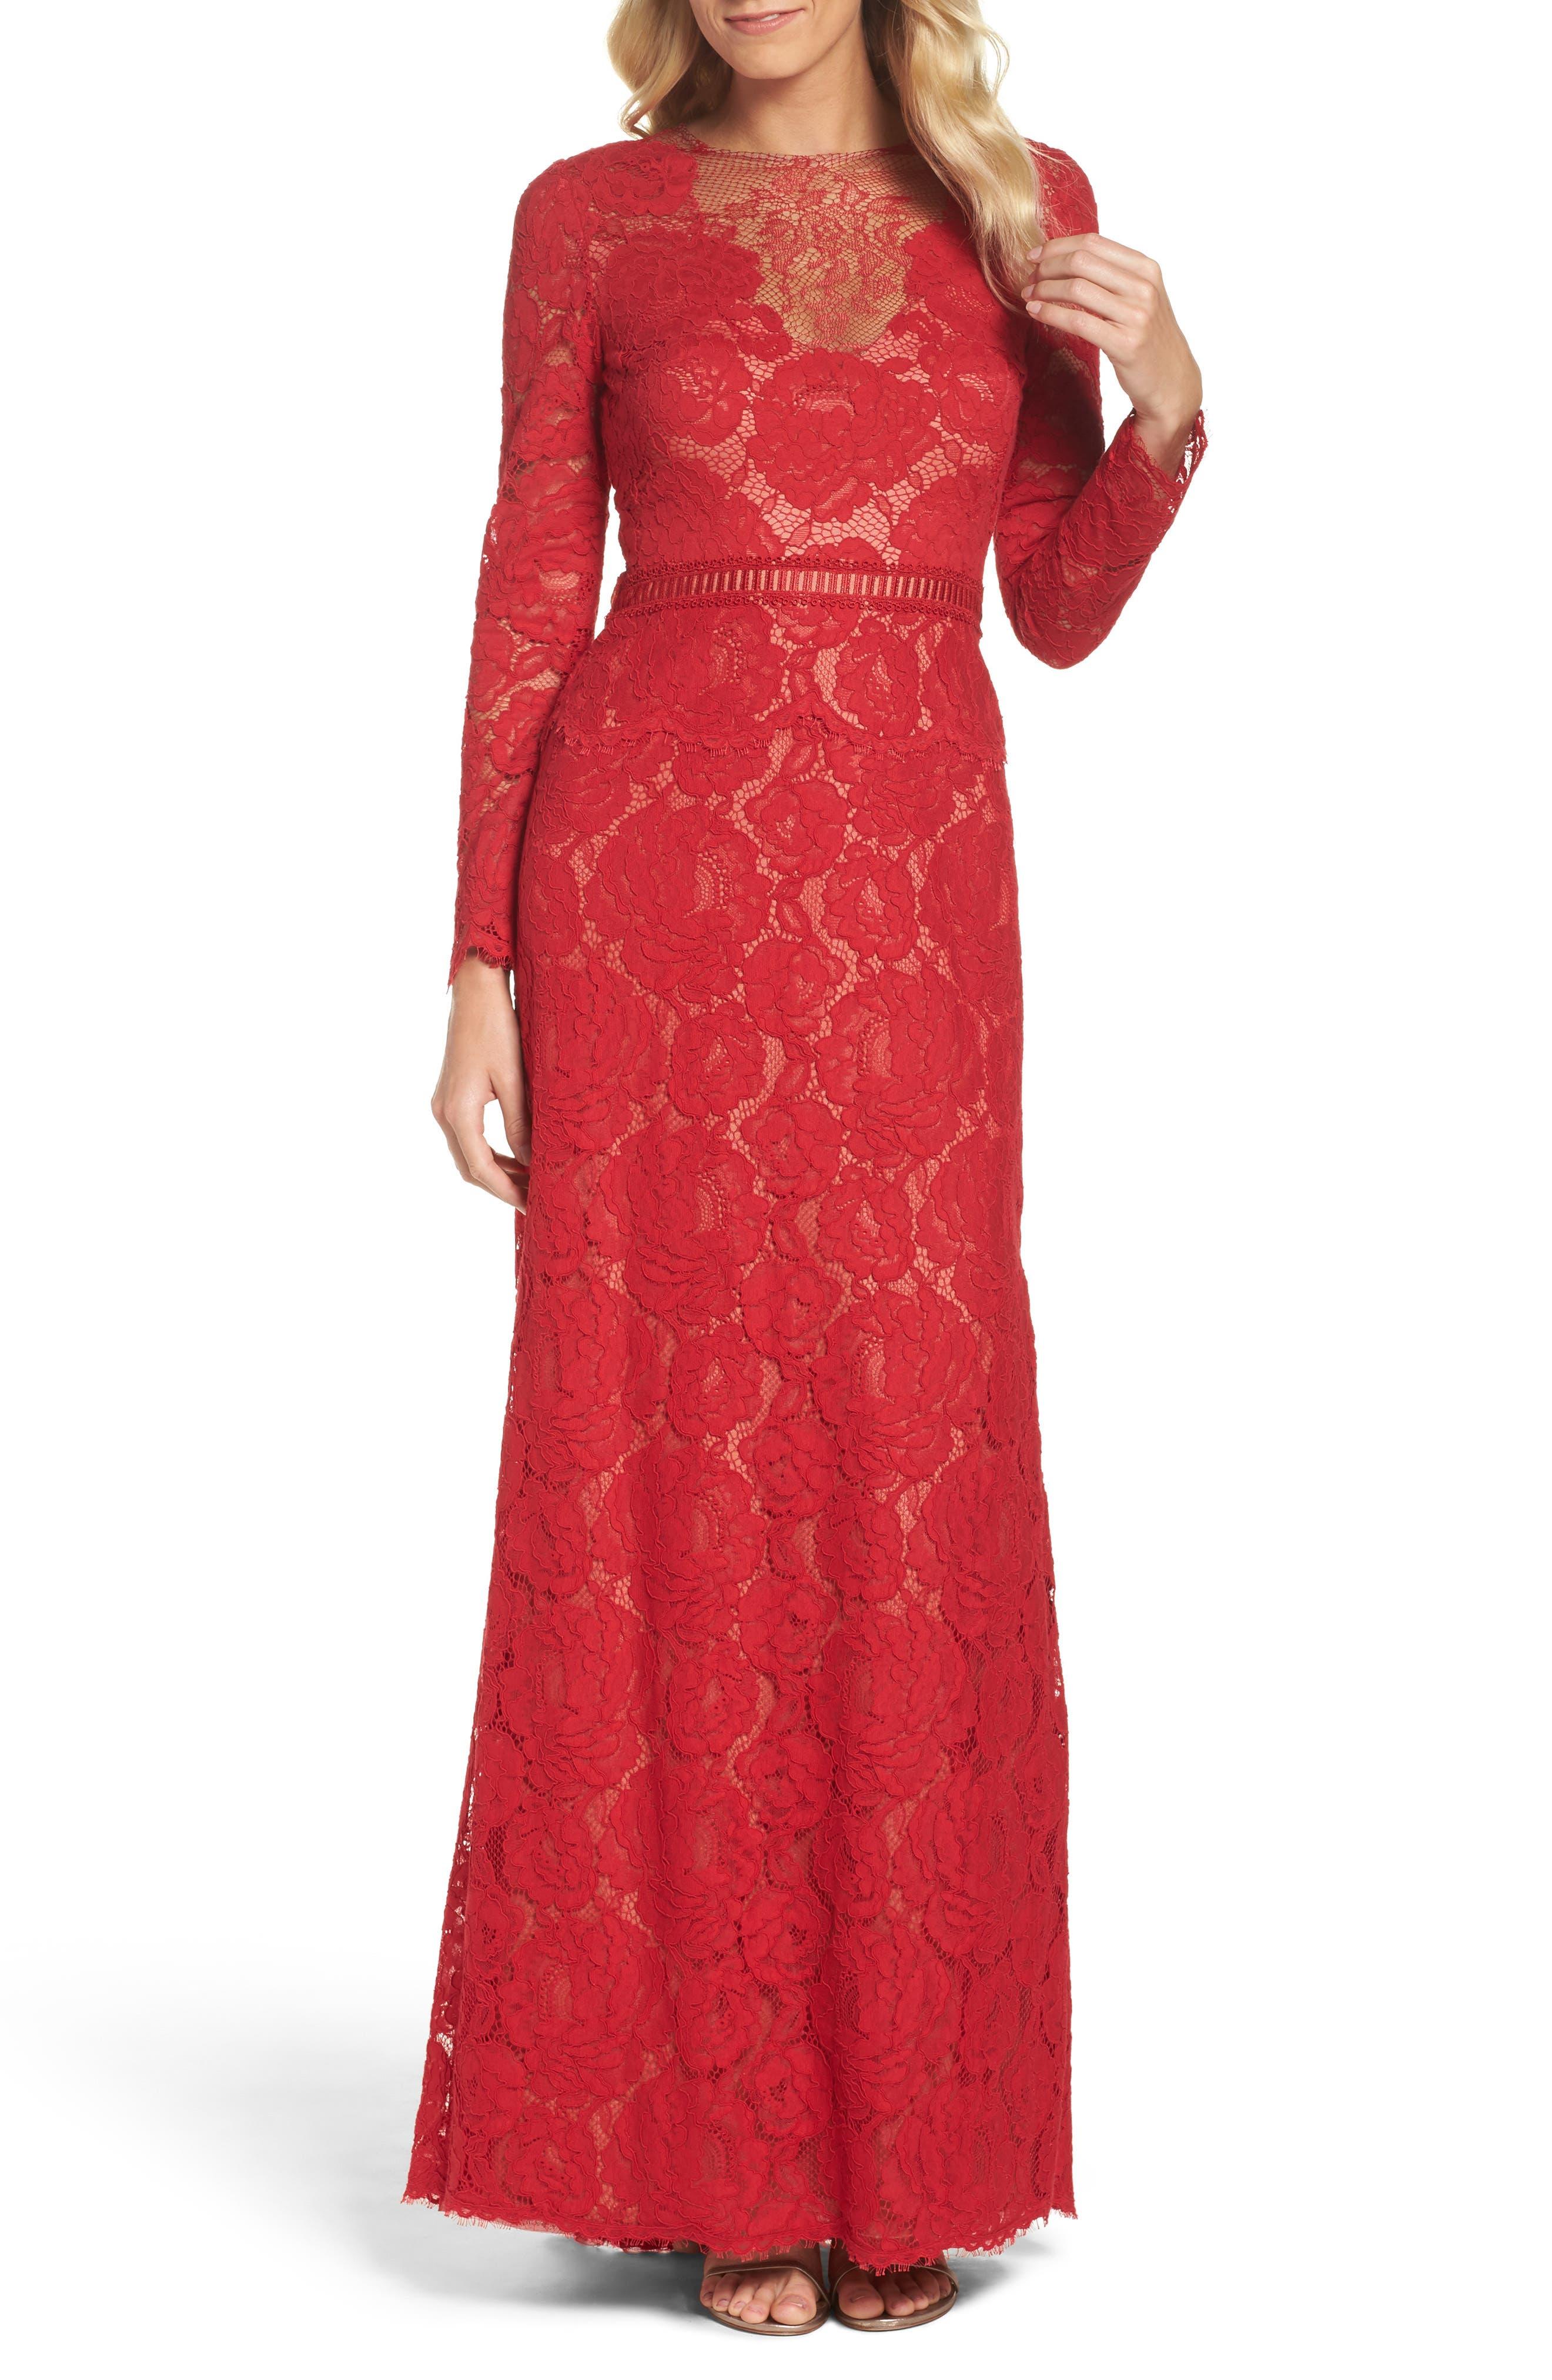 Alternate Image 1 Selected - Tadashi Shoji Corded Lace Gown